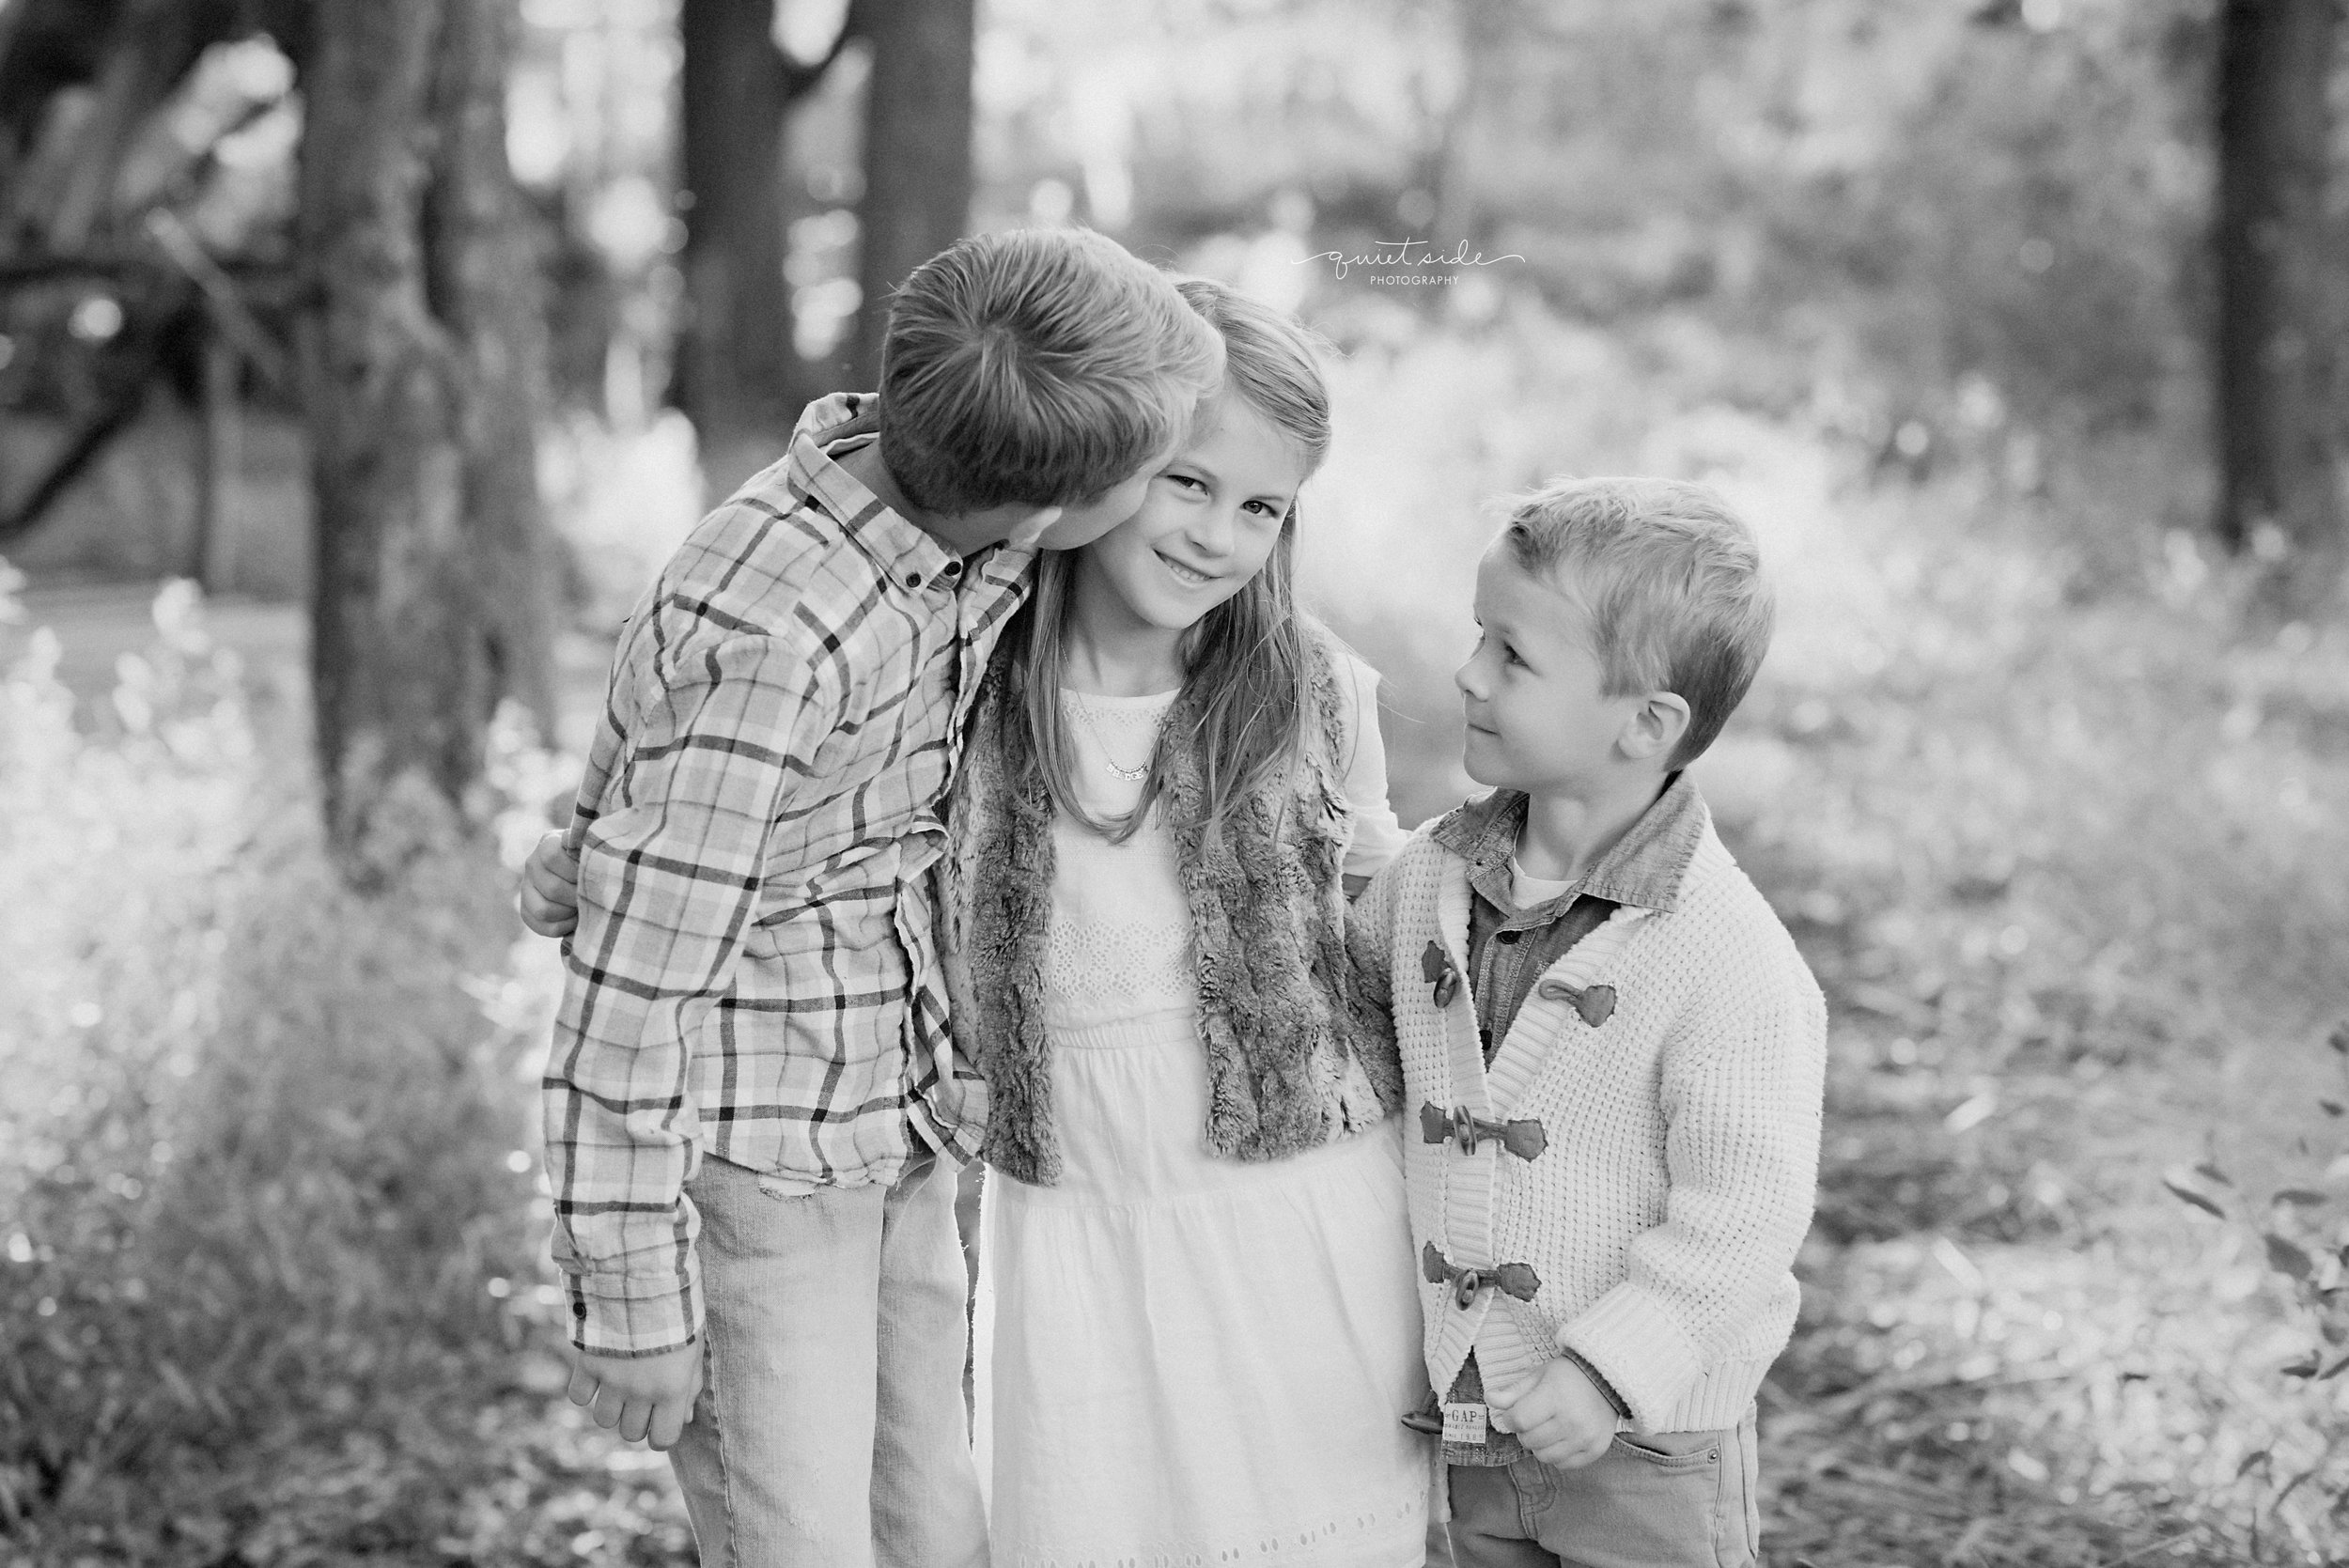 QuietSidePhotography-Purcellville, VA- Family-Photographer-Motherhood-Familyof5-SilverbrookFarm-GoldenHour-Sunset-Family-siblings-brothersandsisters-blackandwhite-Loudoun County-Virginia-MIlesFamily.jpg